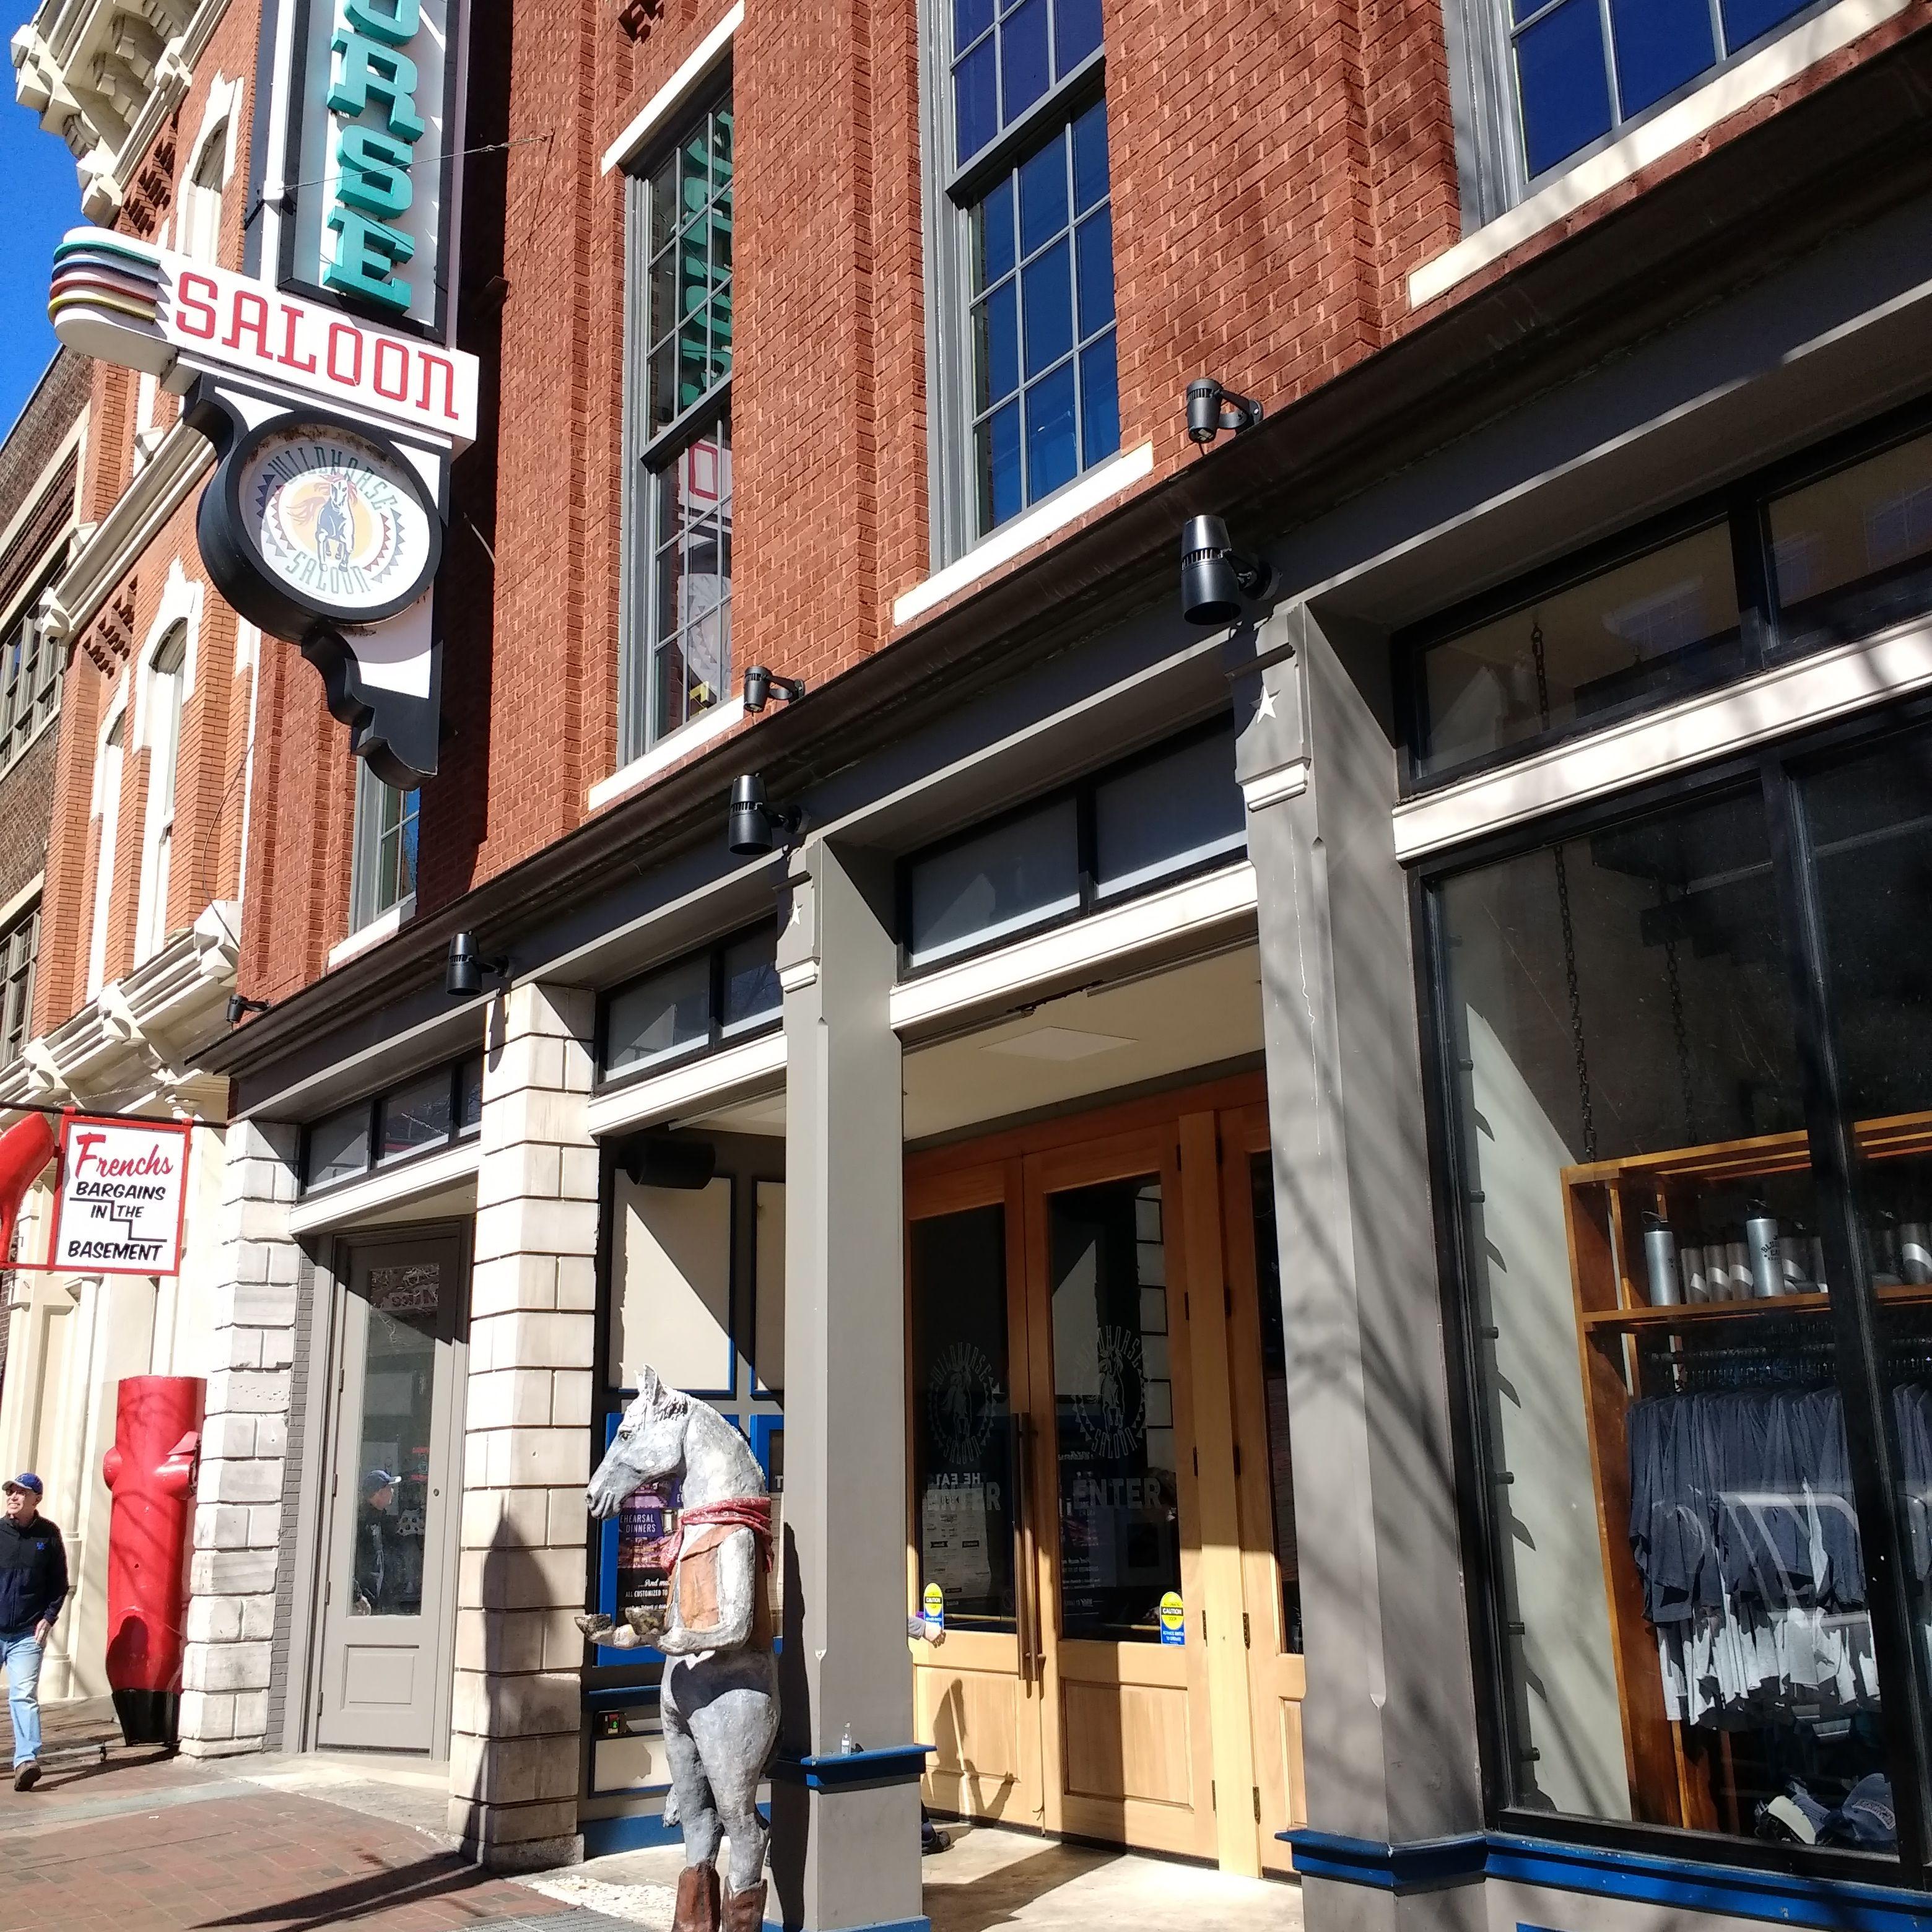 Wildhorse Saloon, Historic Second Avenue